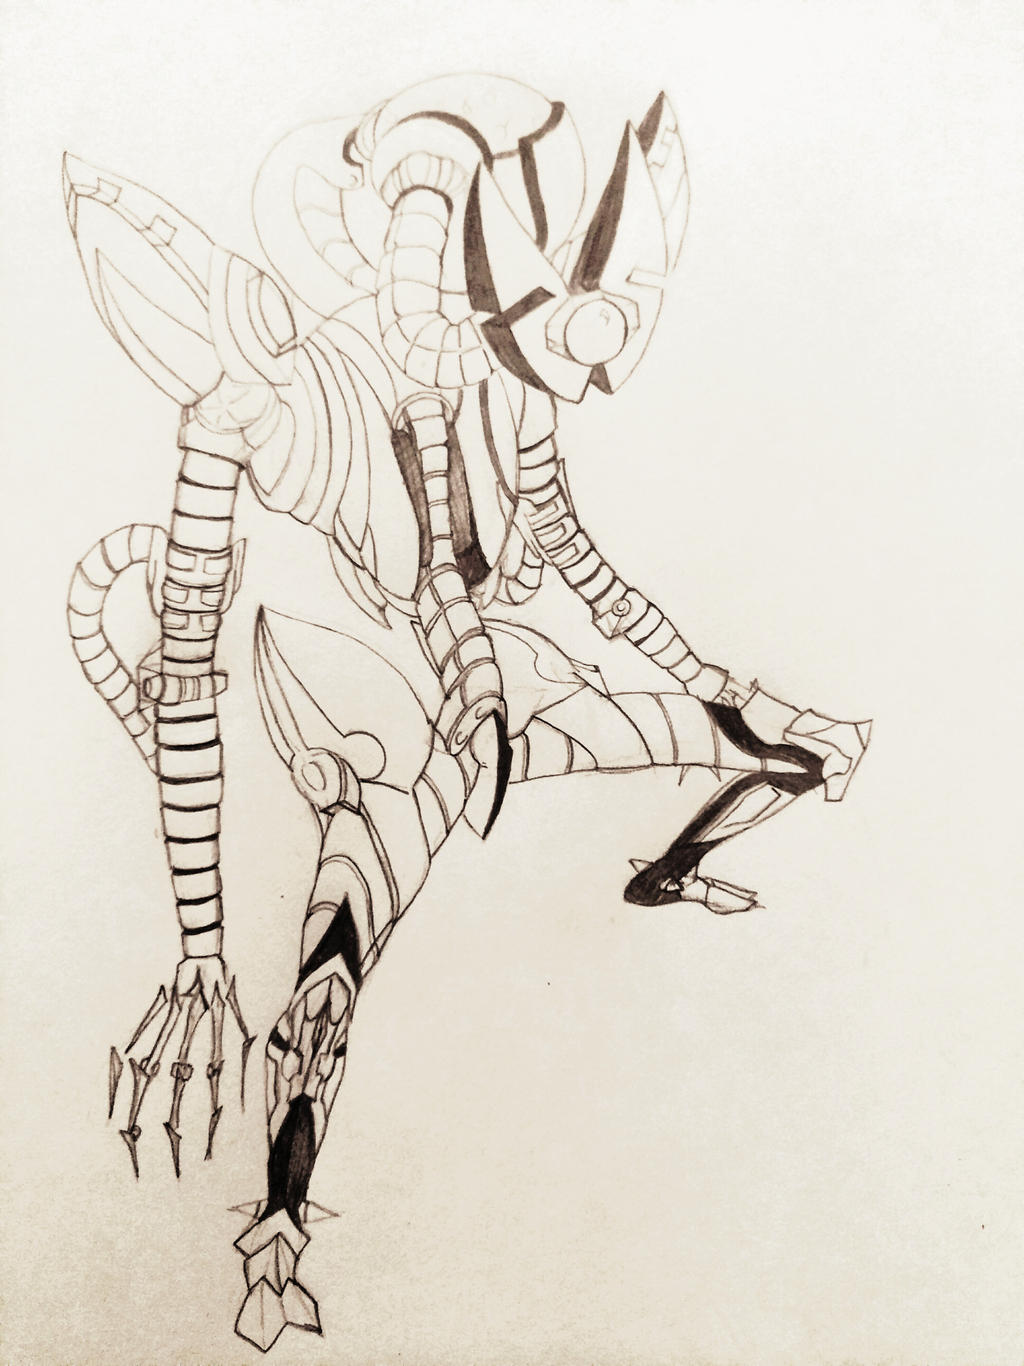 Long claw